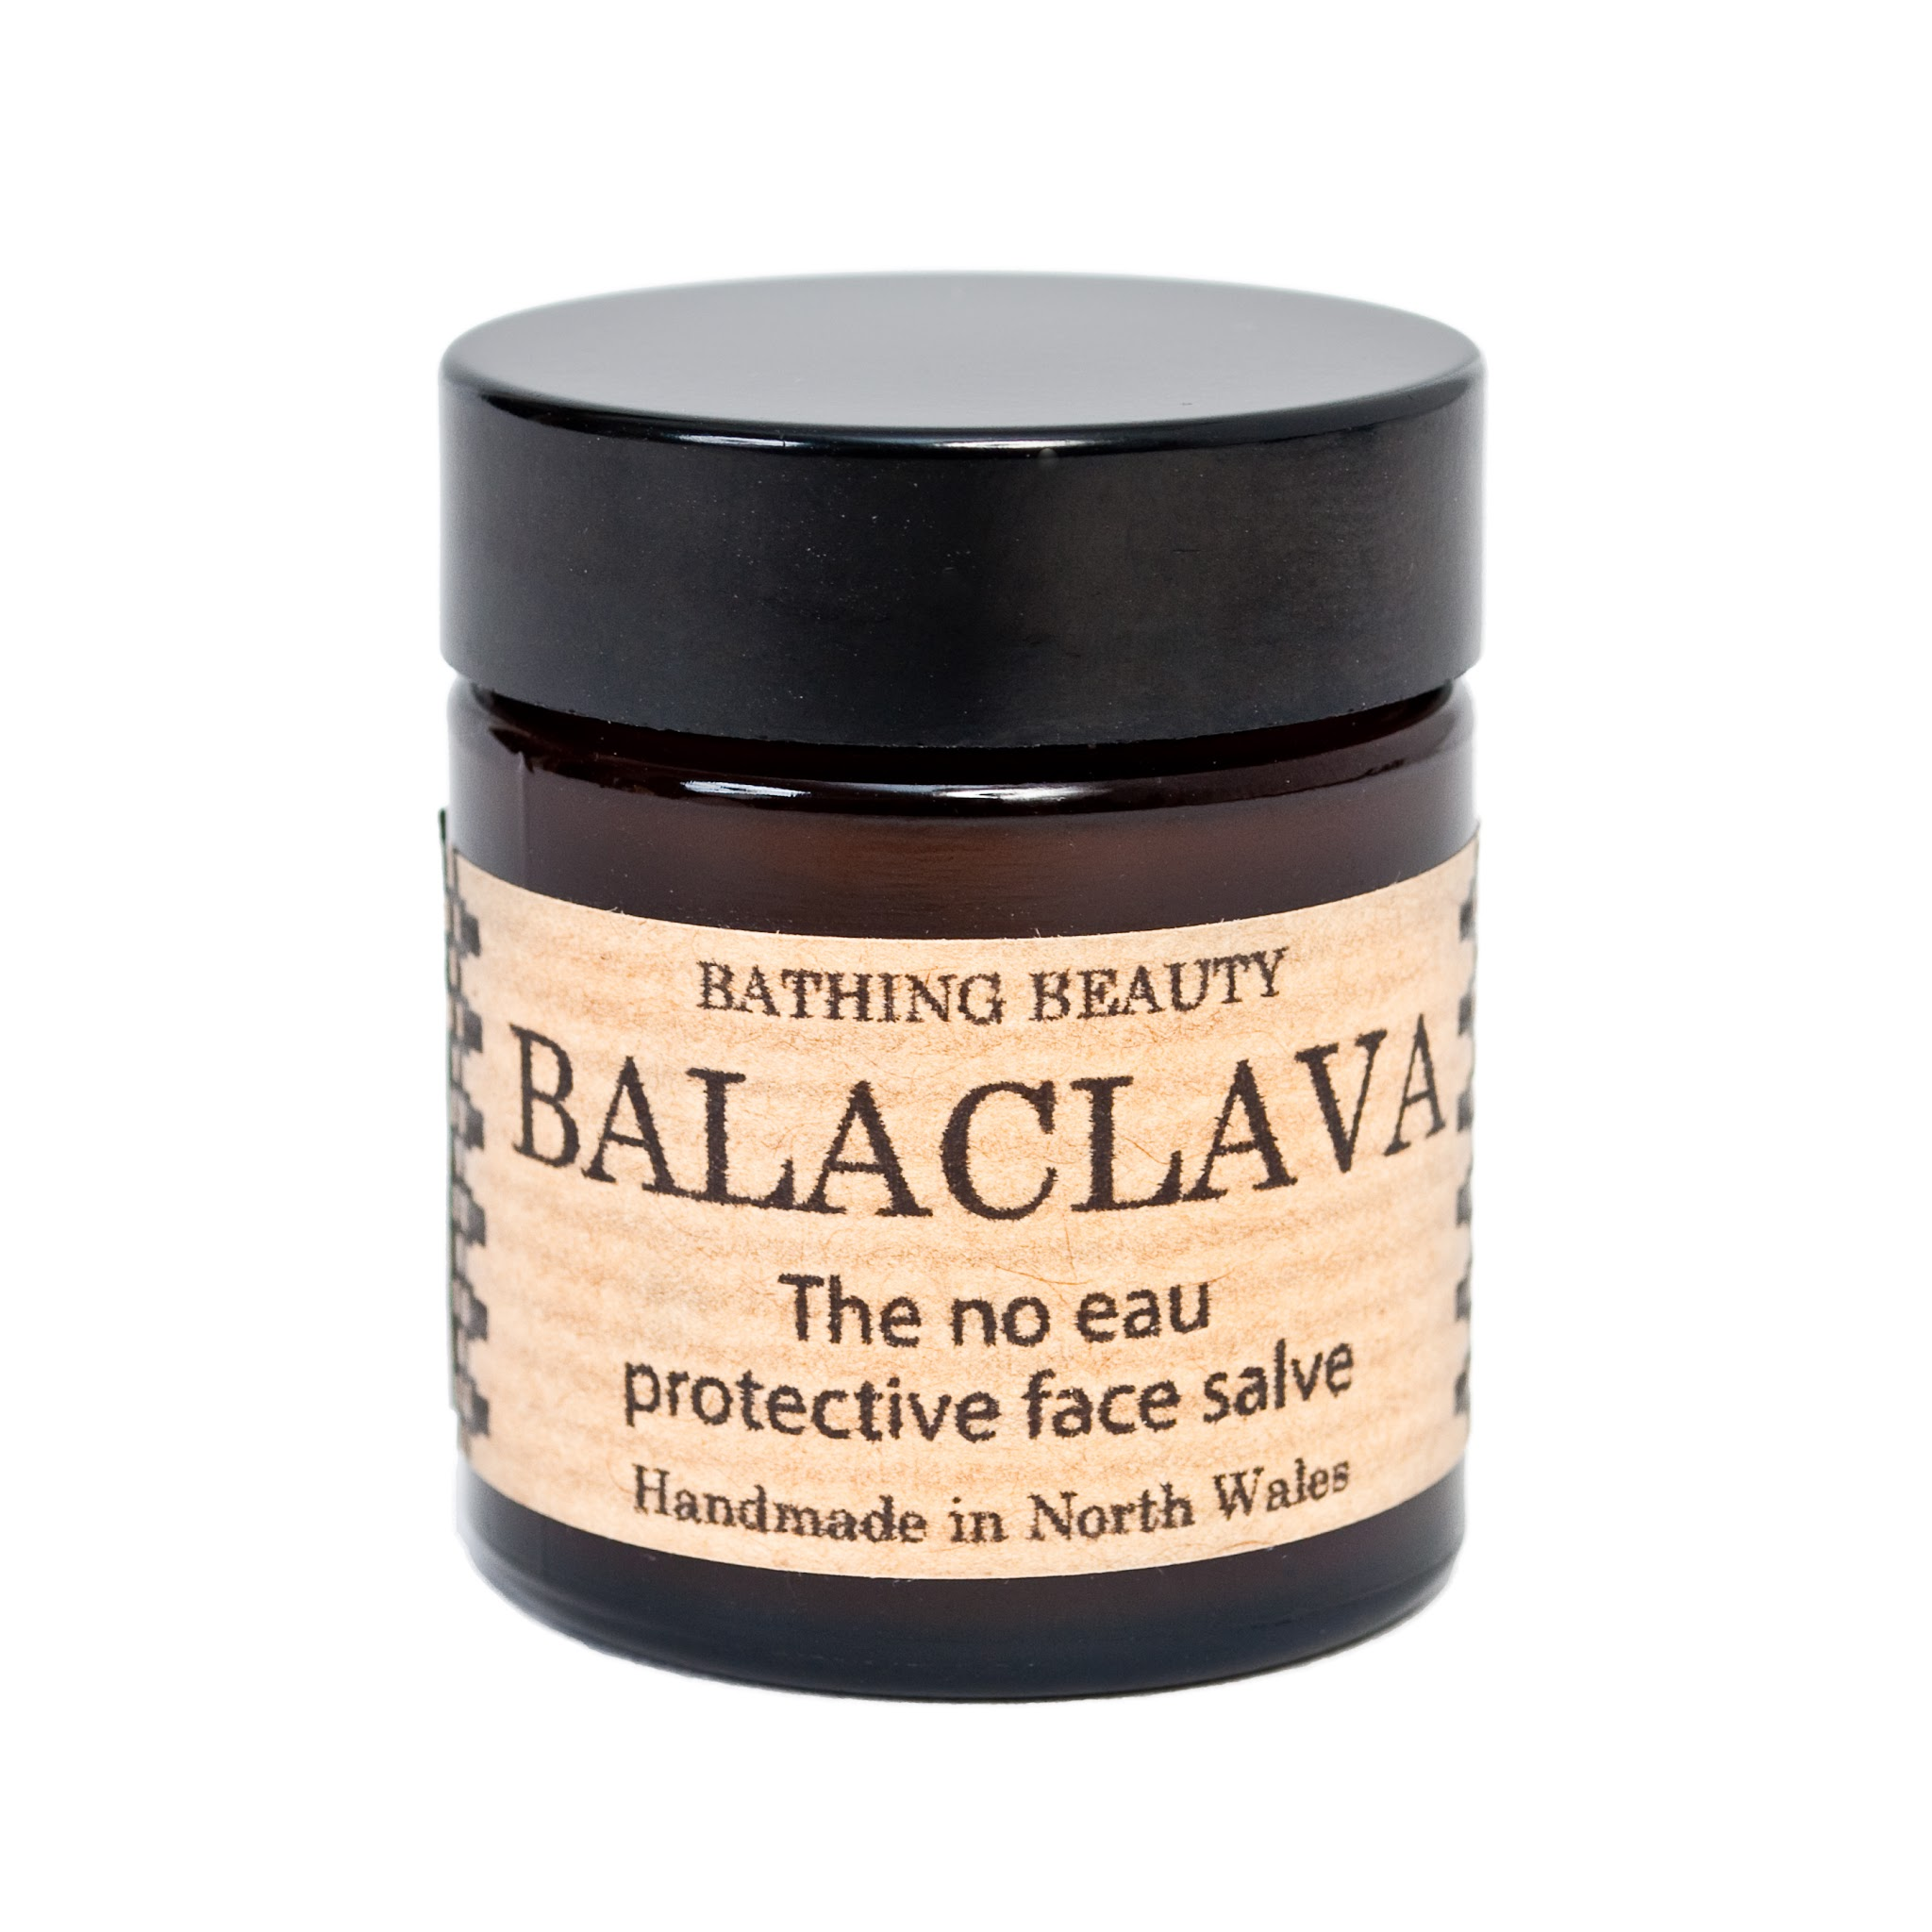 Balaclava, protective face salve